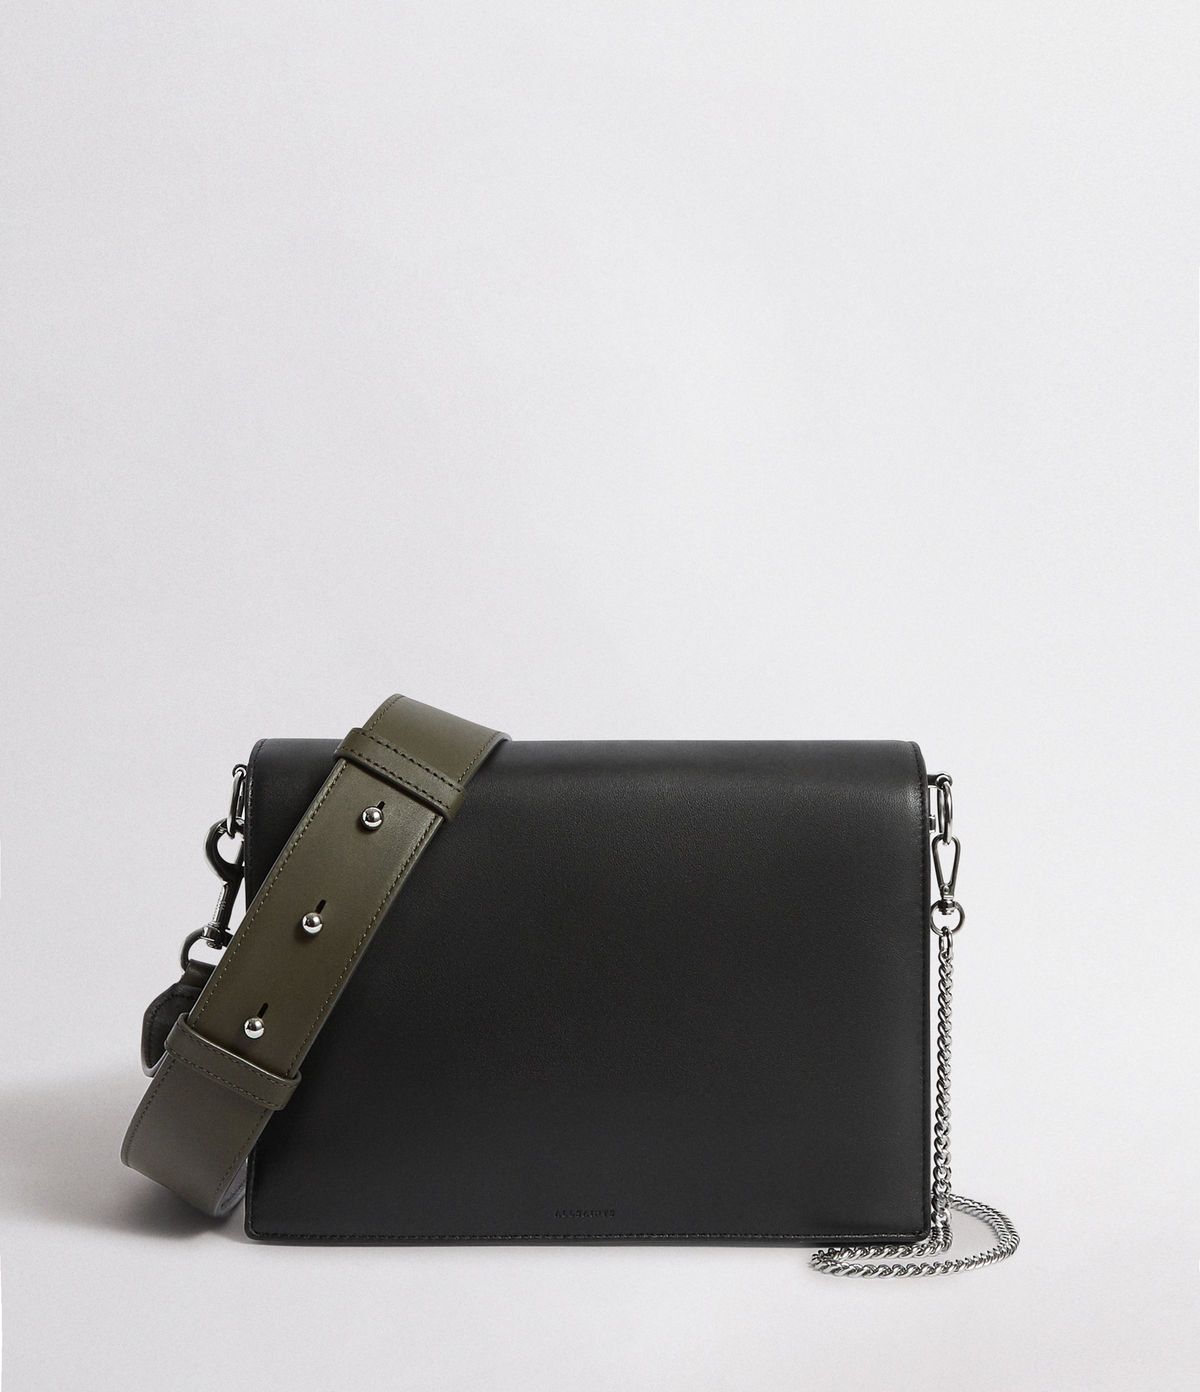 zep-box-bag